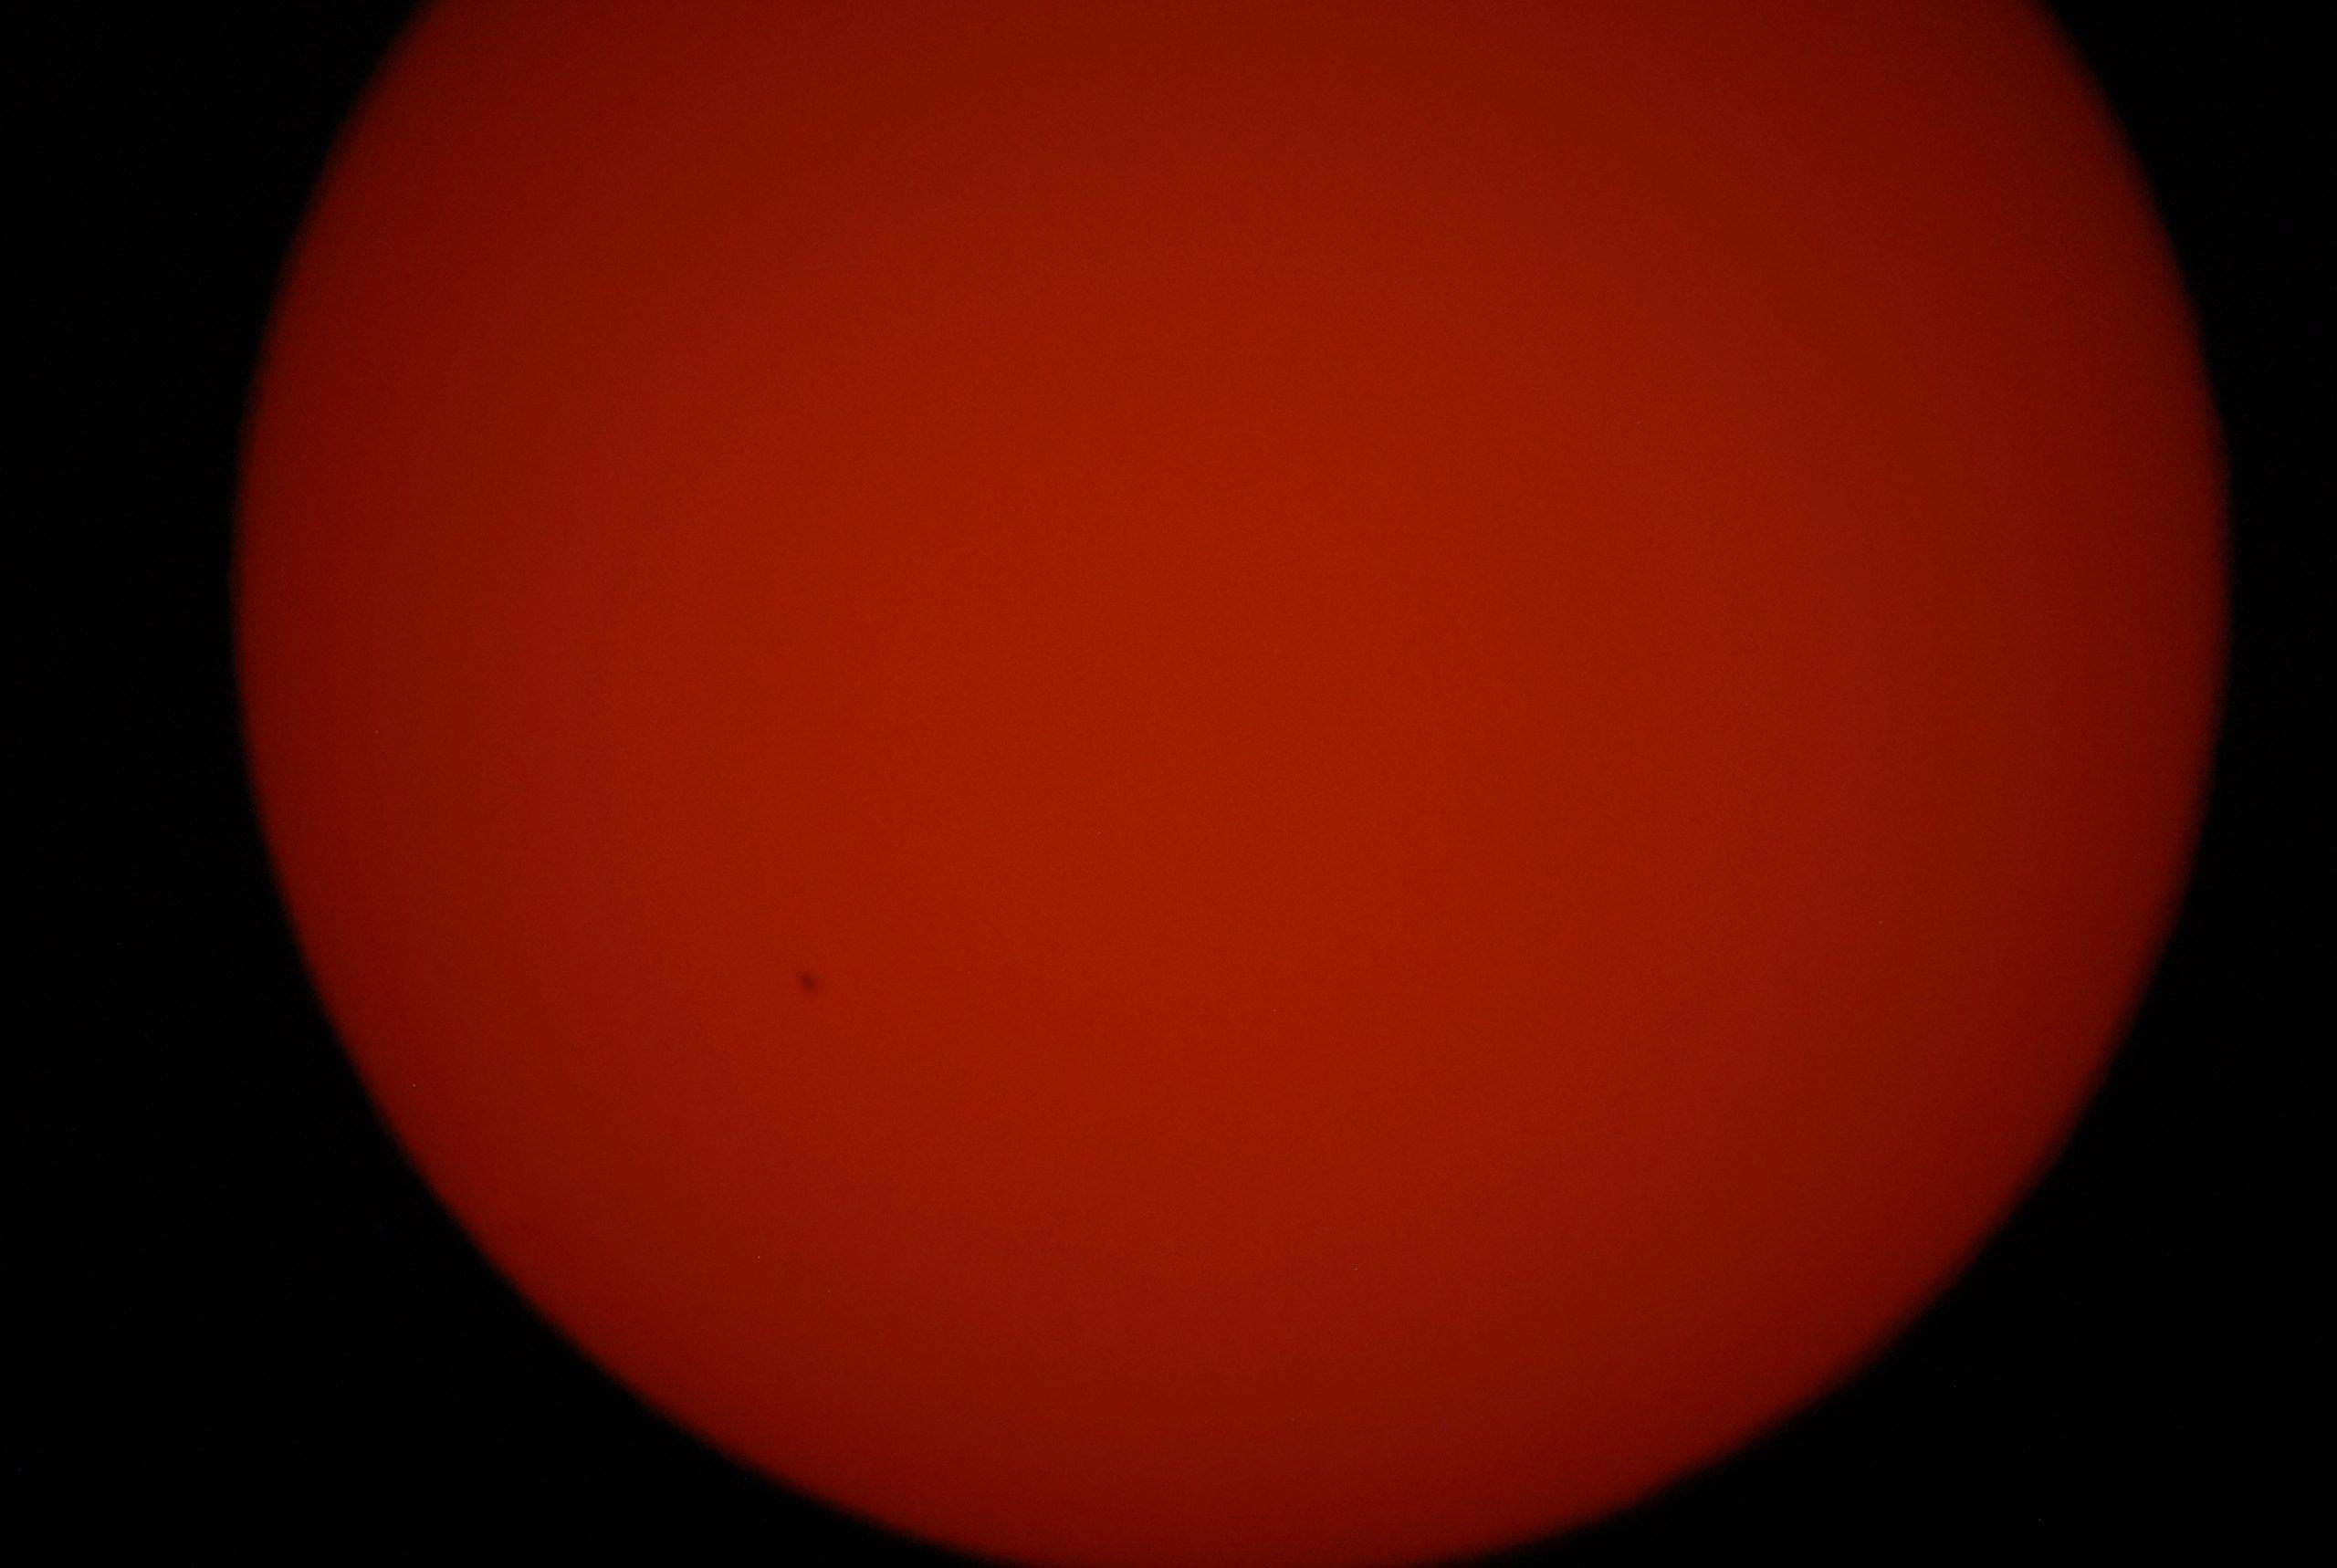 Solar Filter Film Spectrum Telescope (ST12x12SS) Solar Optical Thin Film Sheets BUILD YOUR OWN SOLAR FILTER